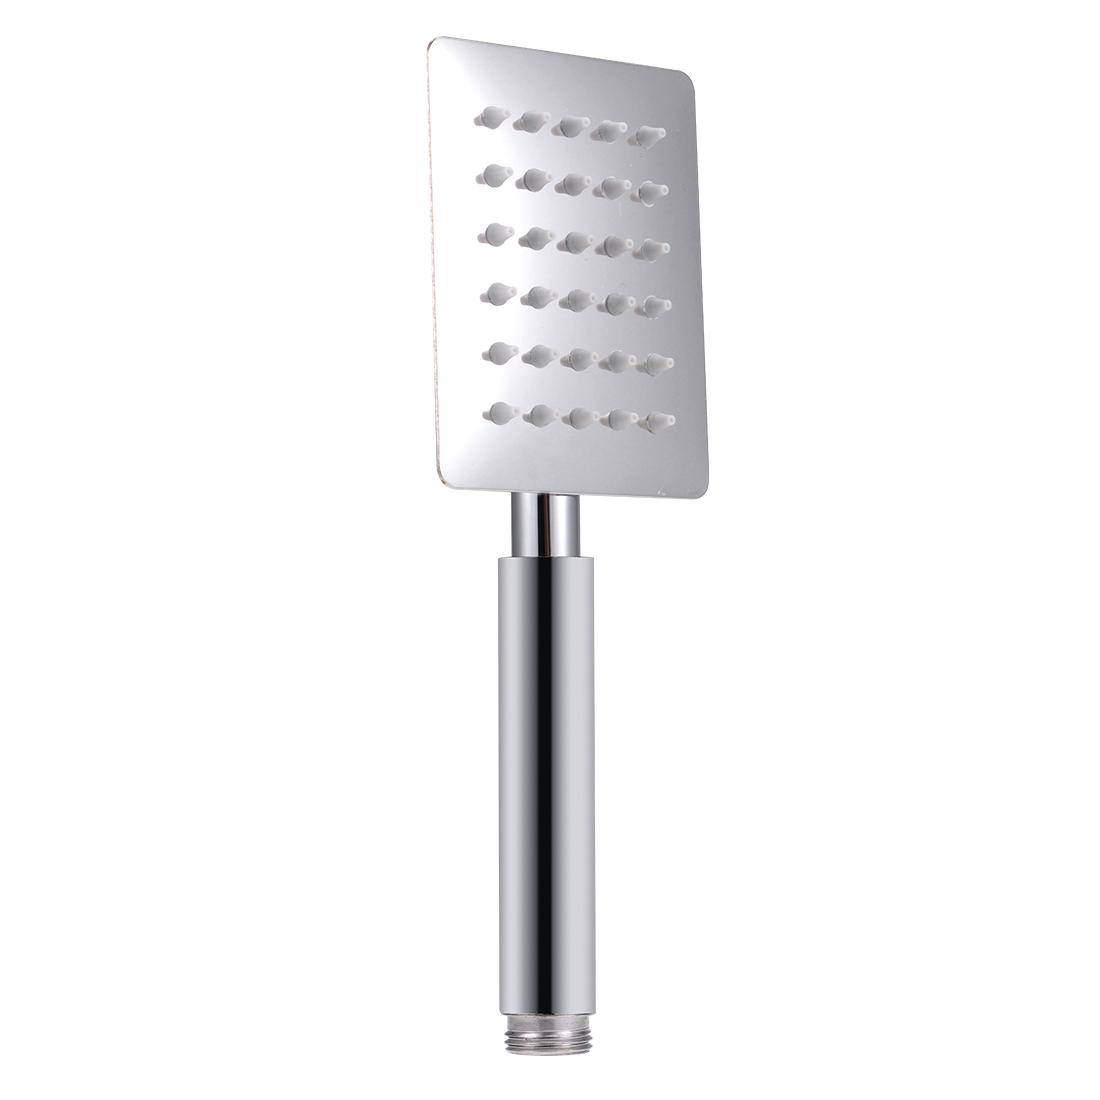 3.15 inch Handheld Shower Head Rain Shower G1/2 Stainless Steel Shower Head